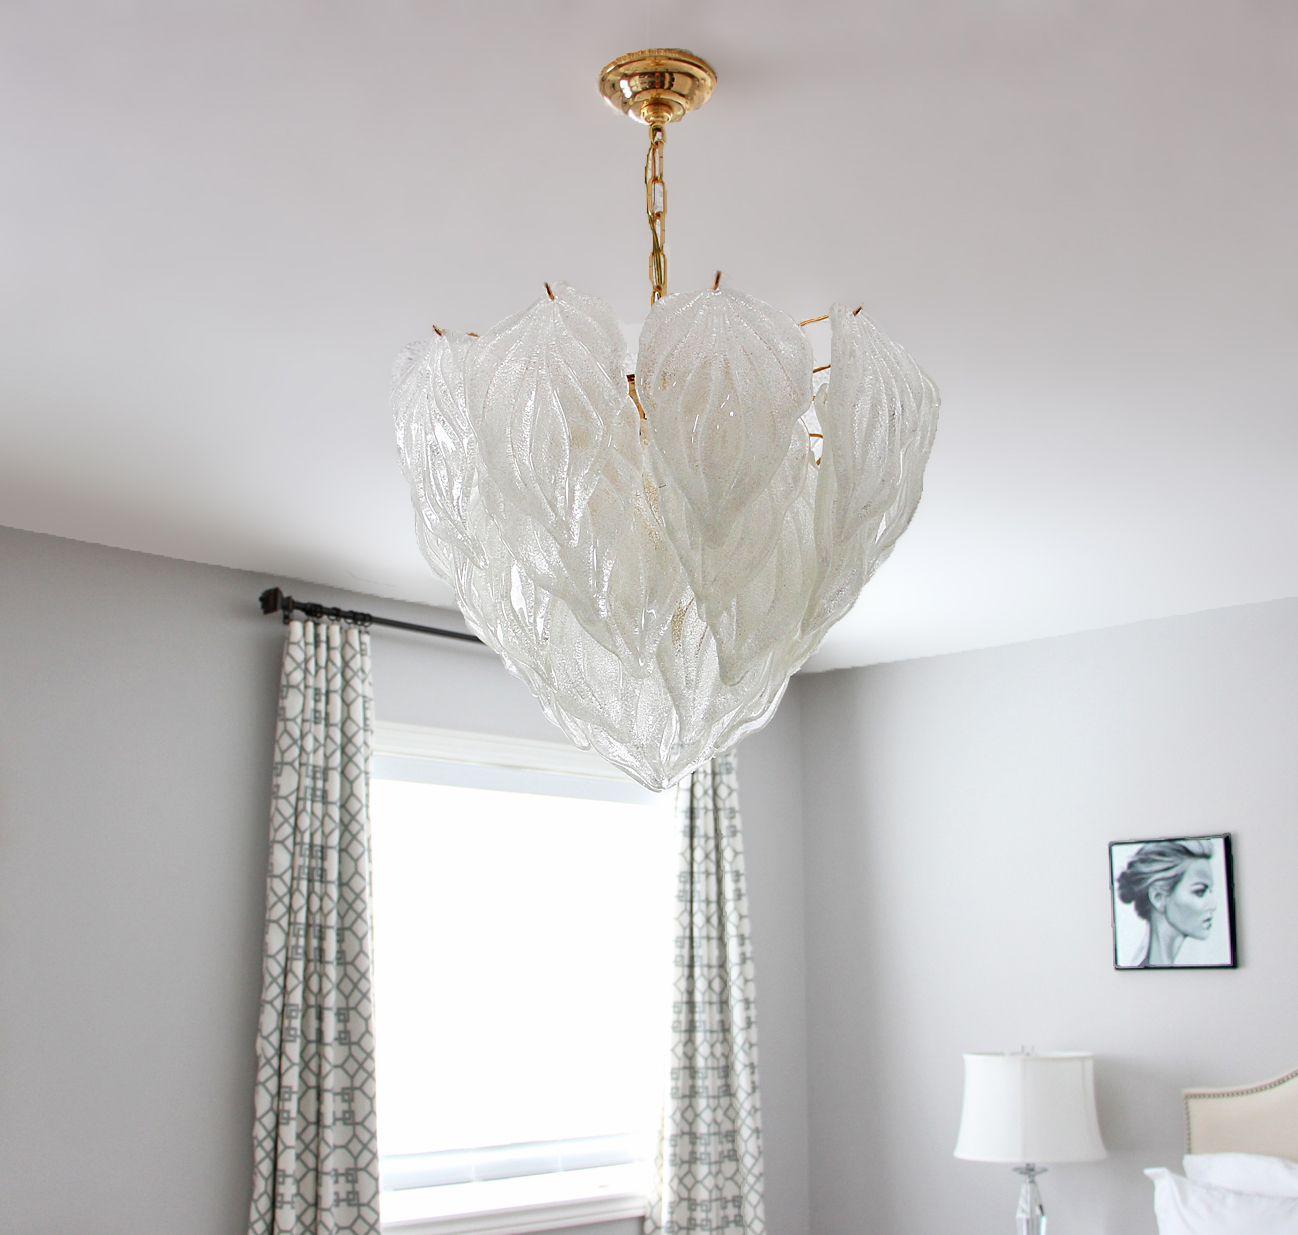 murano glass chandelier by venini | modern chandelier, antiques, Innenarchitektur ideen